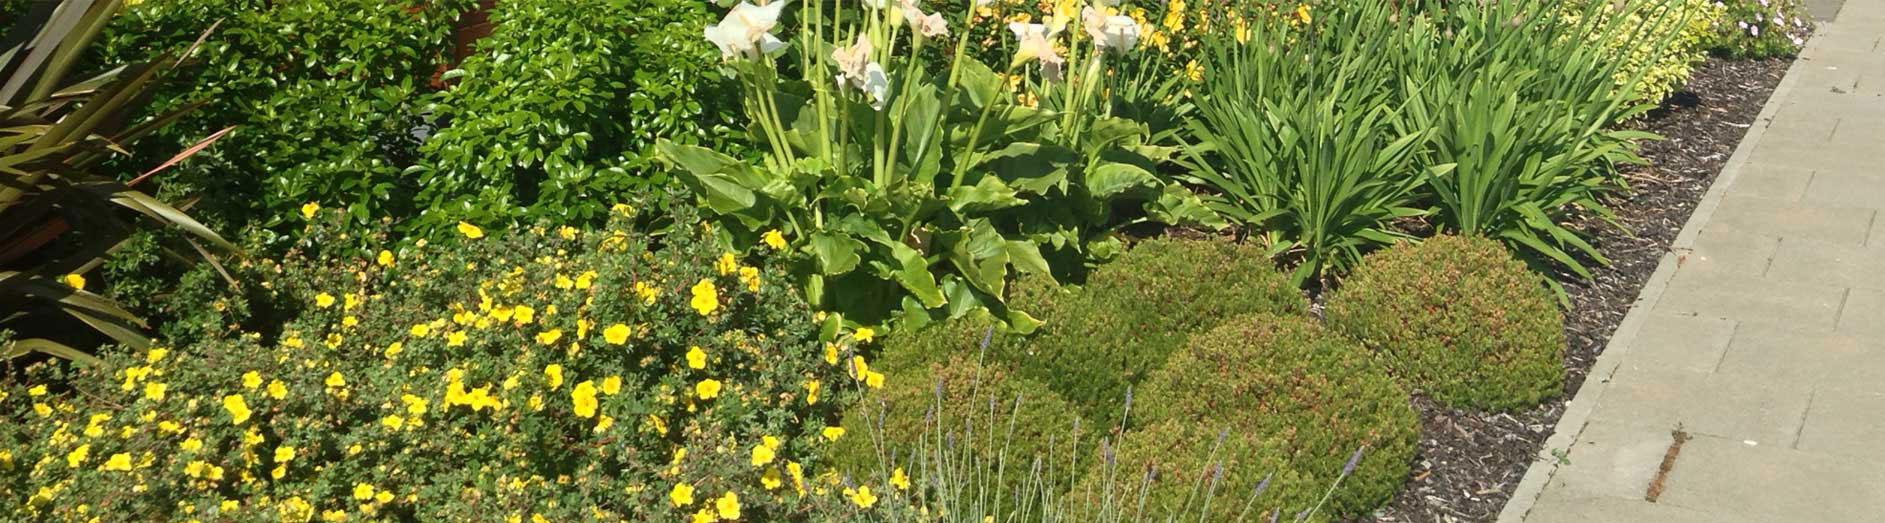 yellow-garden-flowers